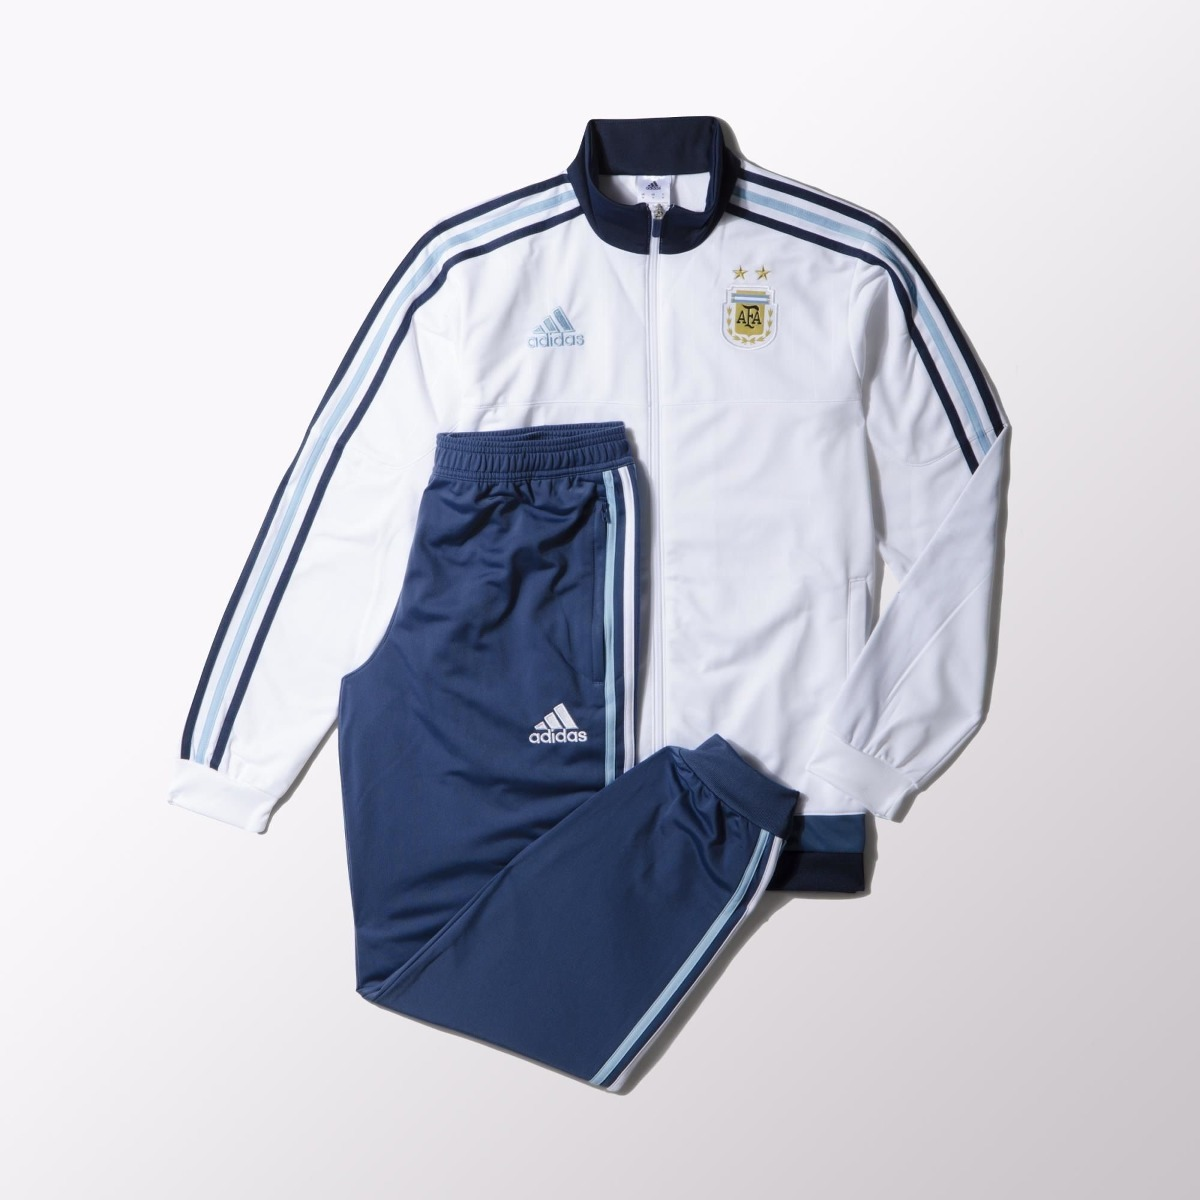 d9e3dea44a4b93 Conjunto adidas Afa Pes Suit 15 - Sagat Deportes - M33263 - $ 2.599 ...